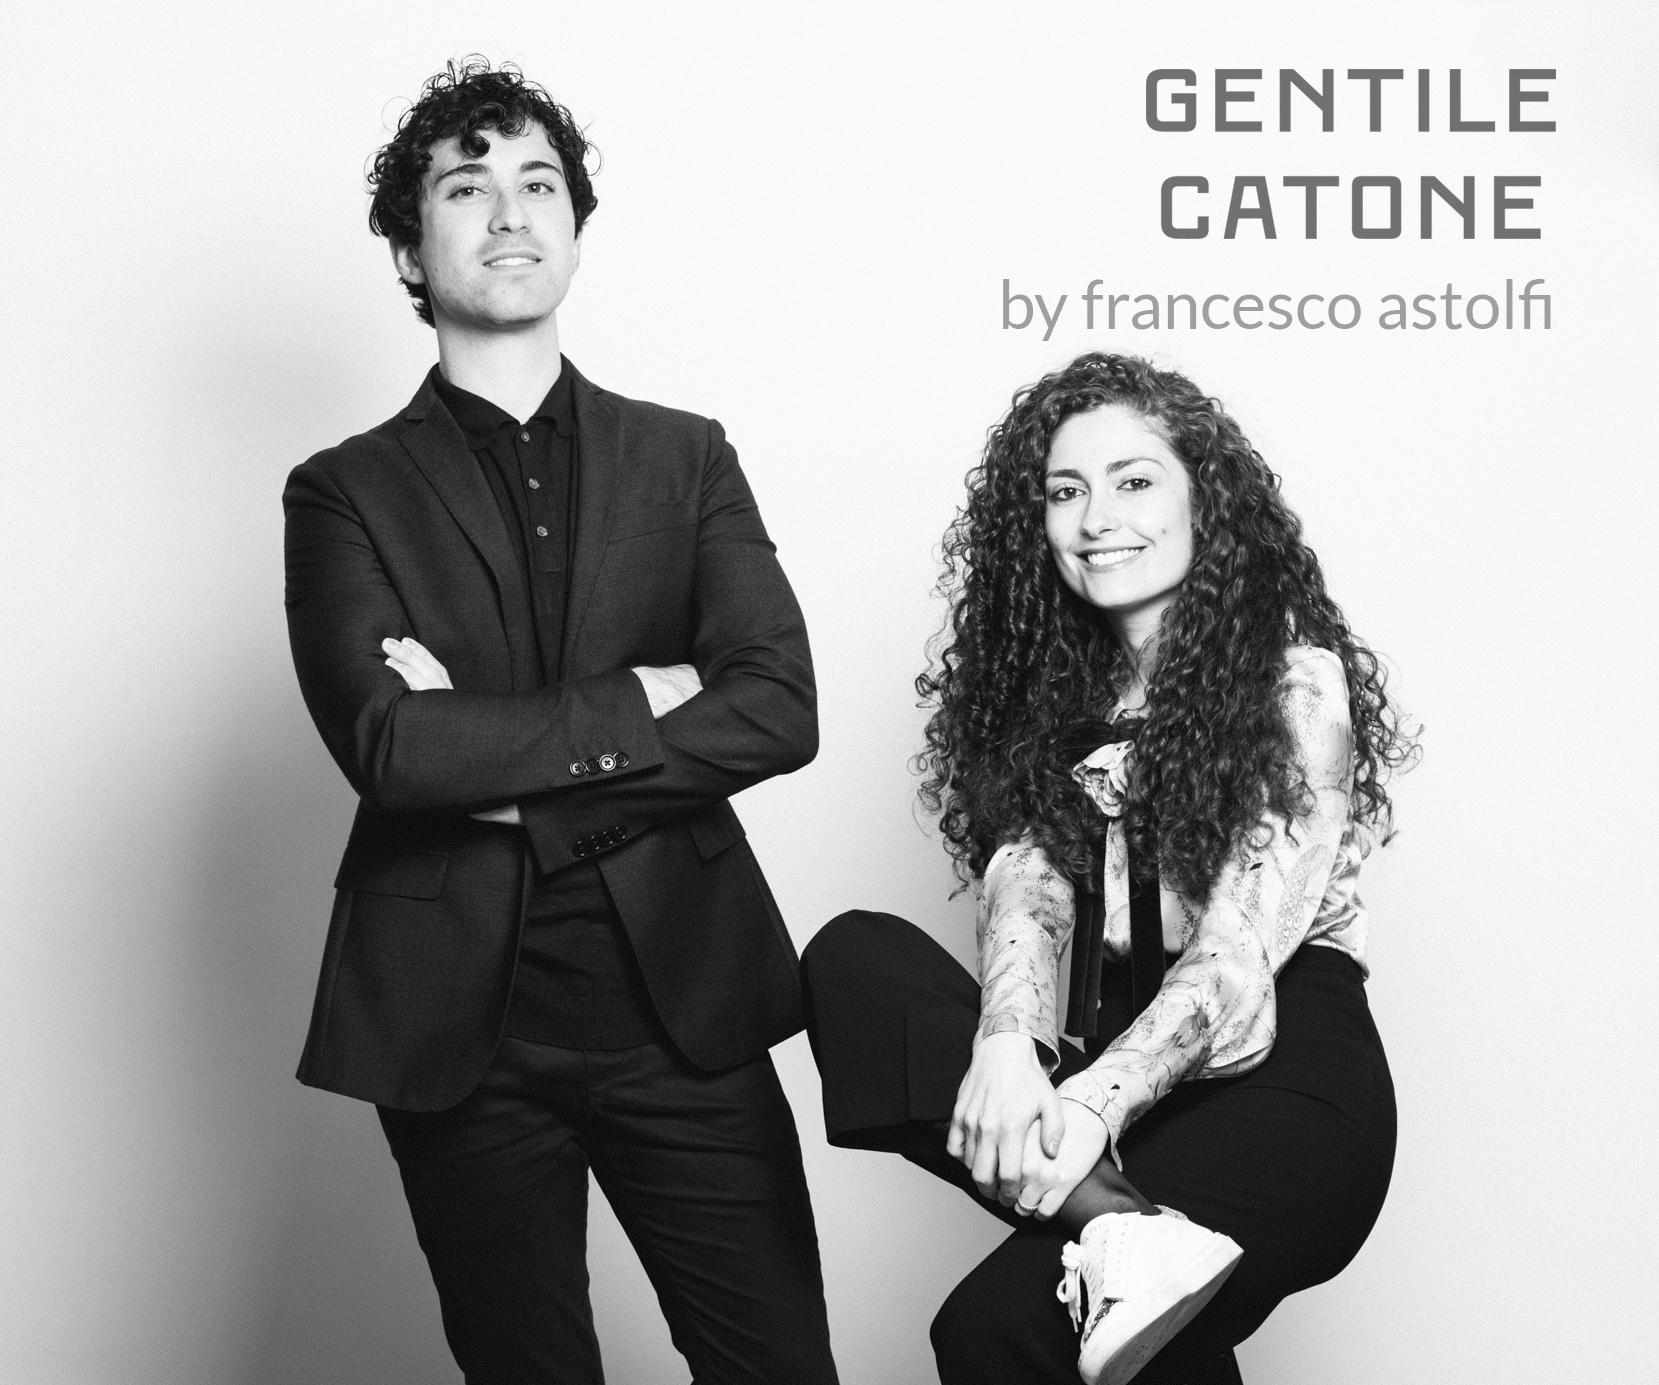 012 - Gentile Catone - Photo by Francesco Astolfi